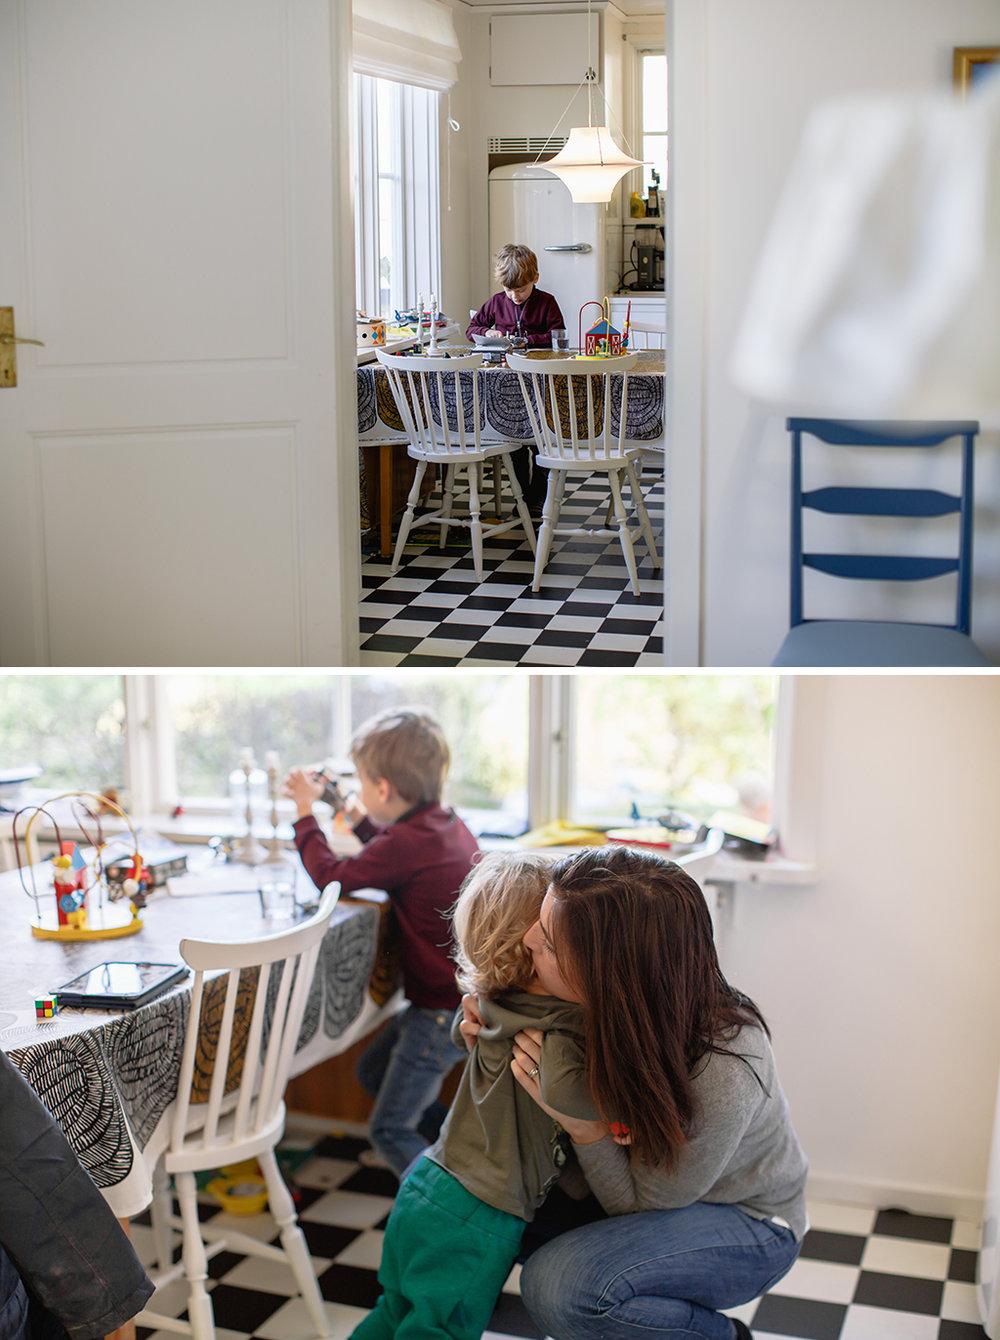 Hostfotografering_Lifestyle_hemma-hos-fotografering_Familjefotograf_Stockholm_6.jpg